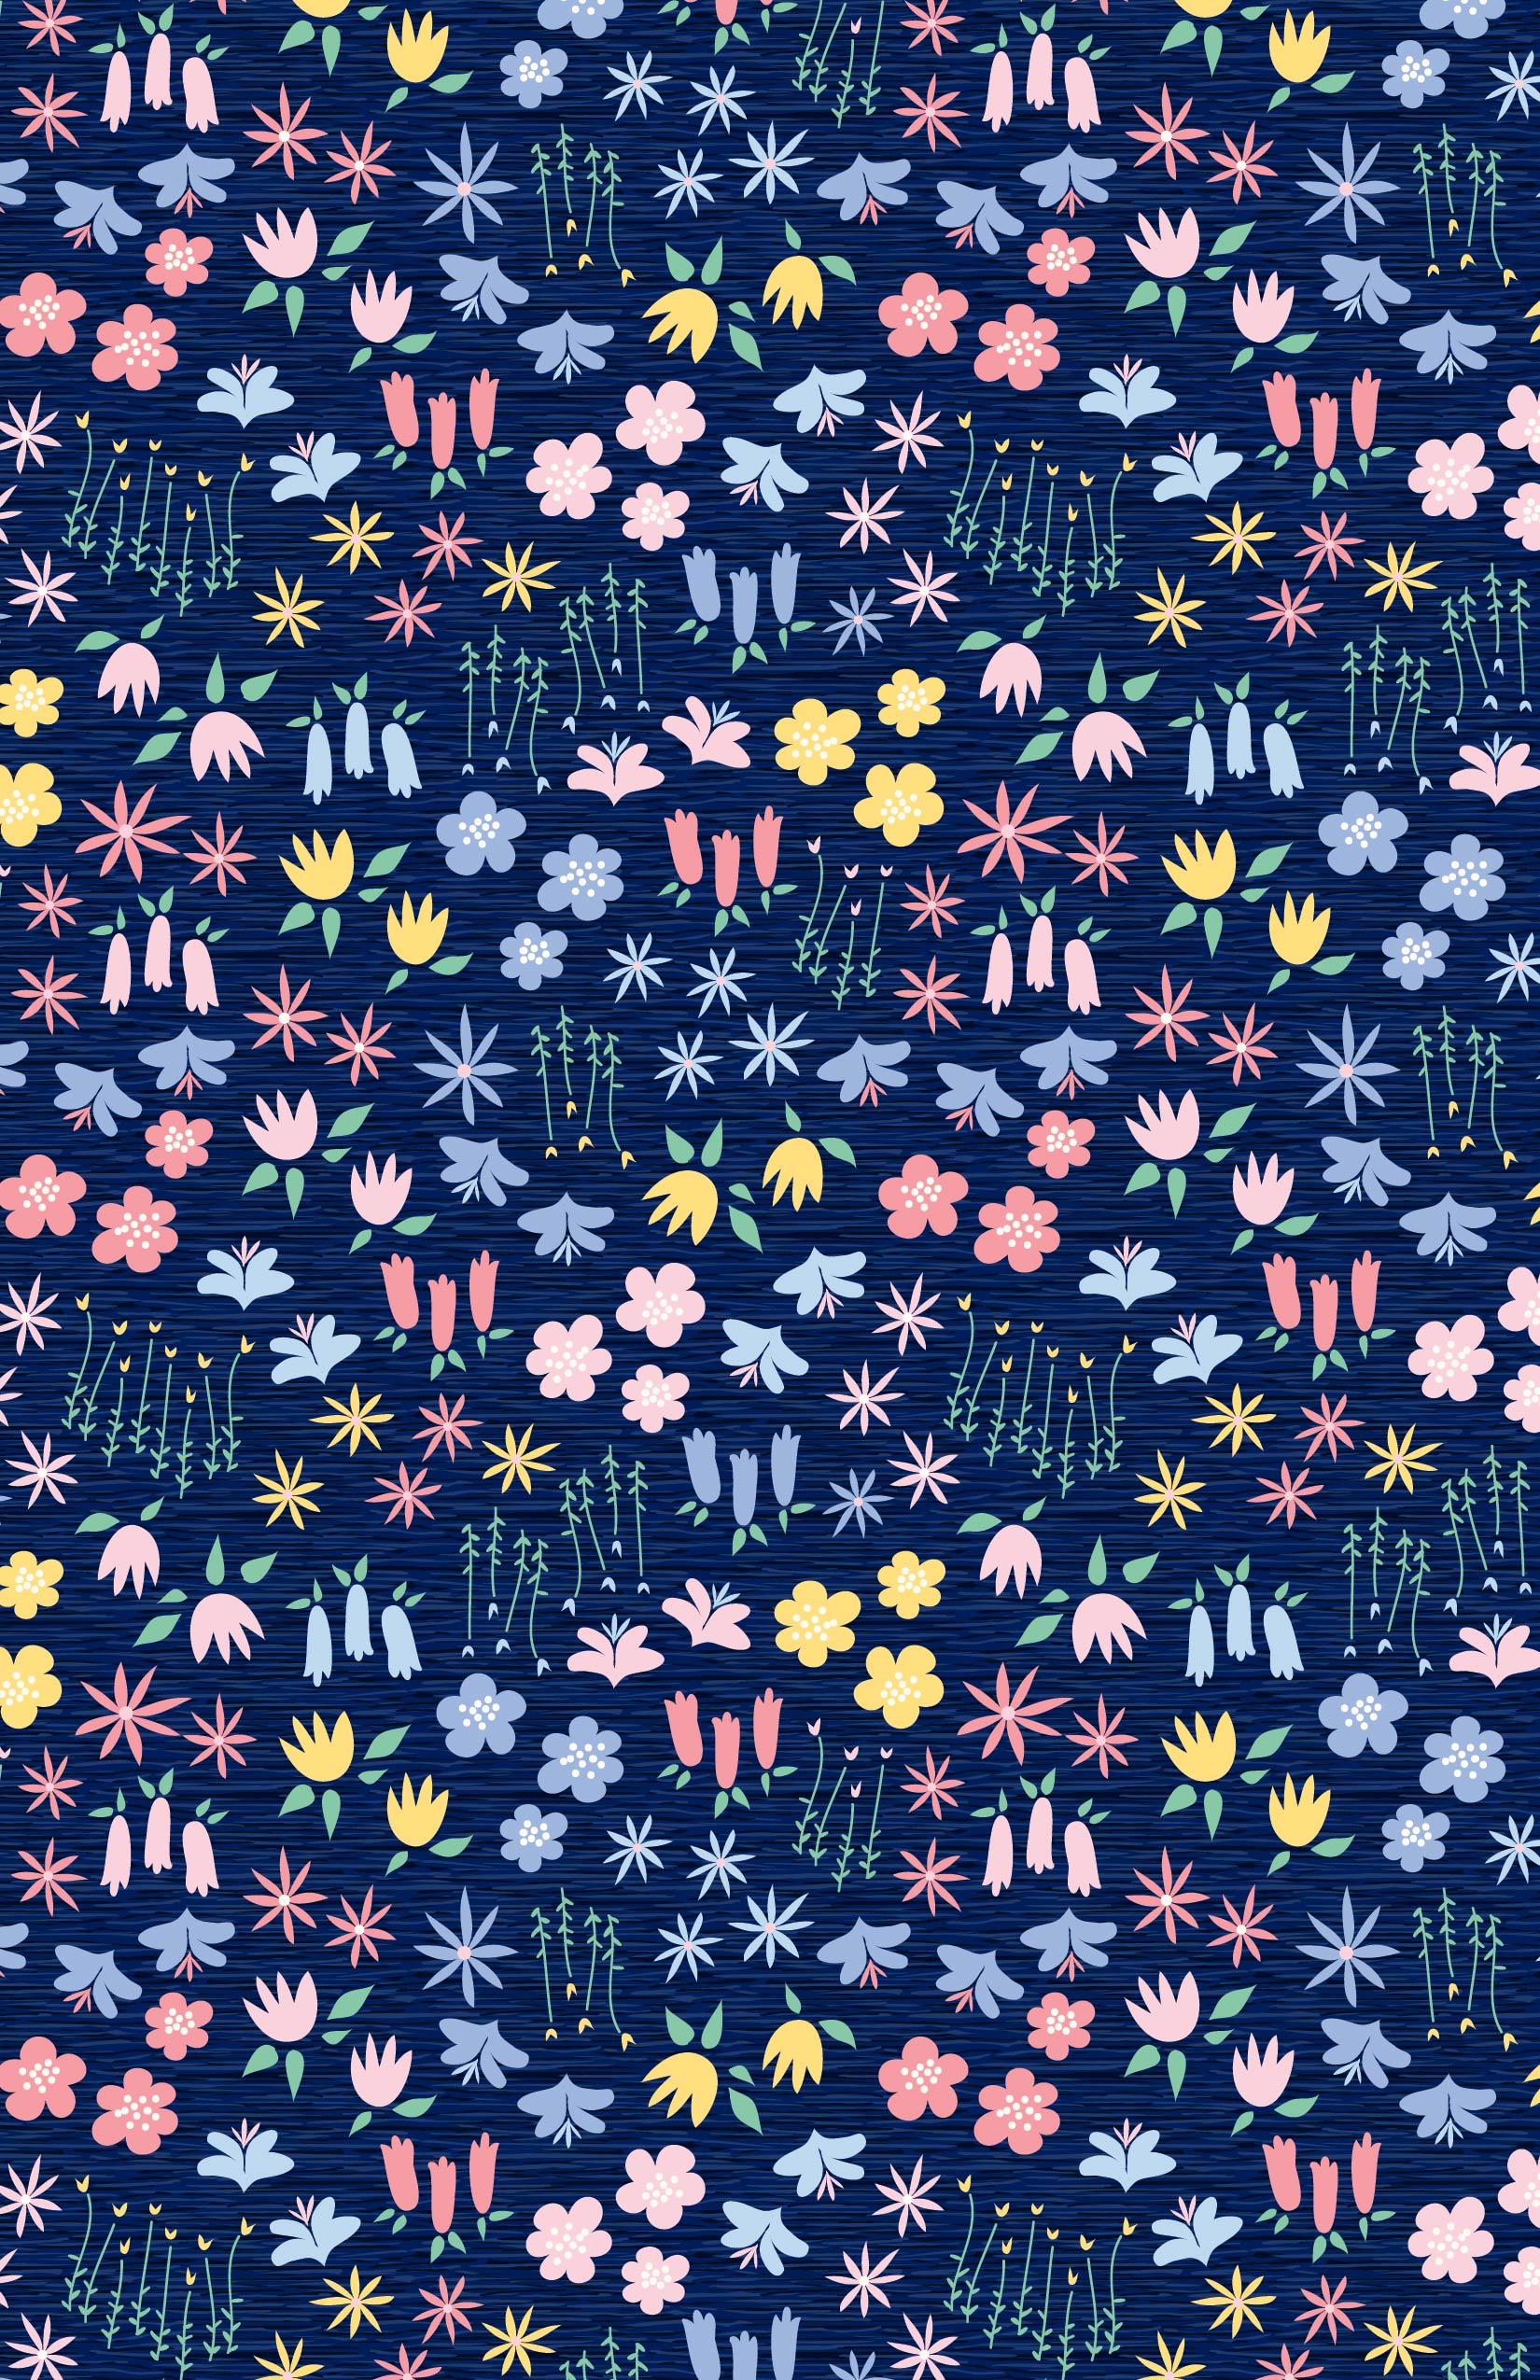 flower cut shapes-01.jpg